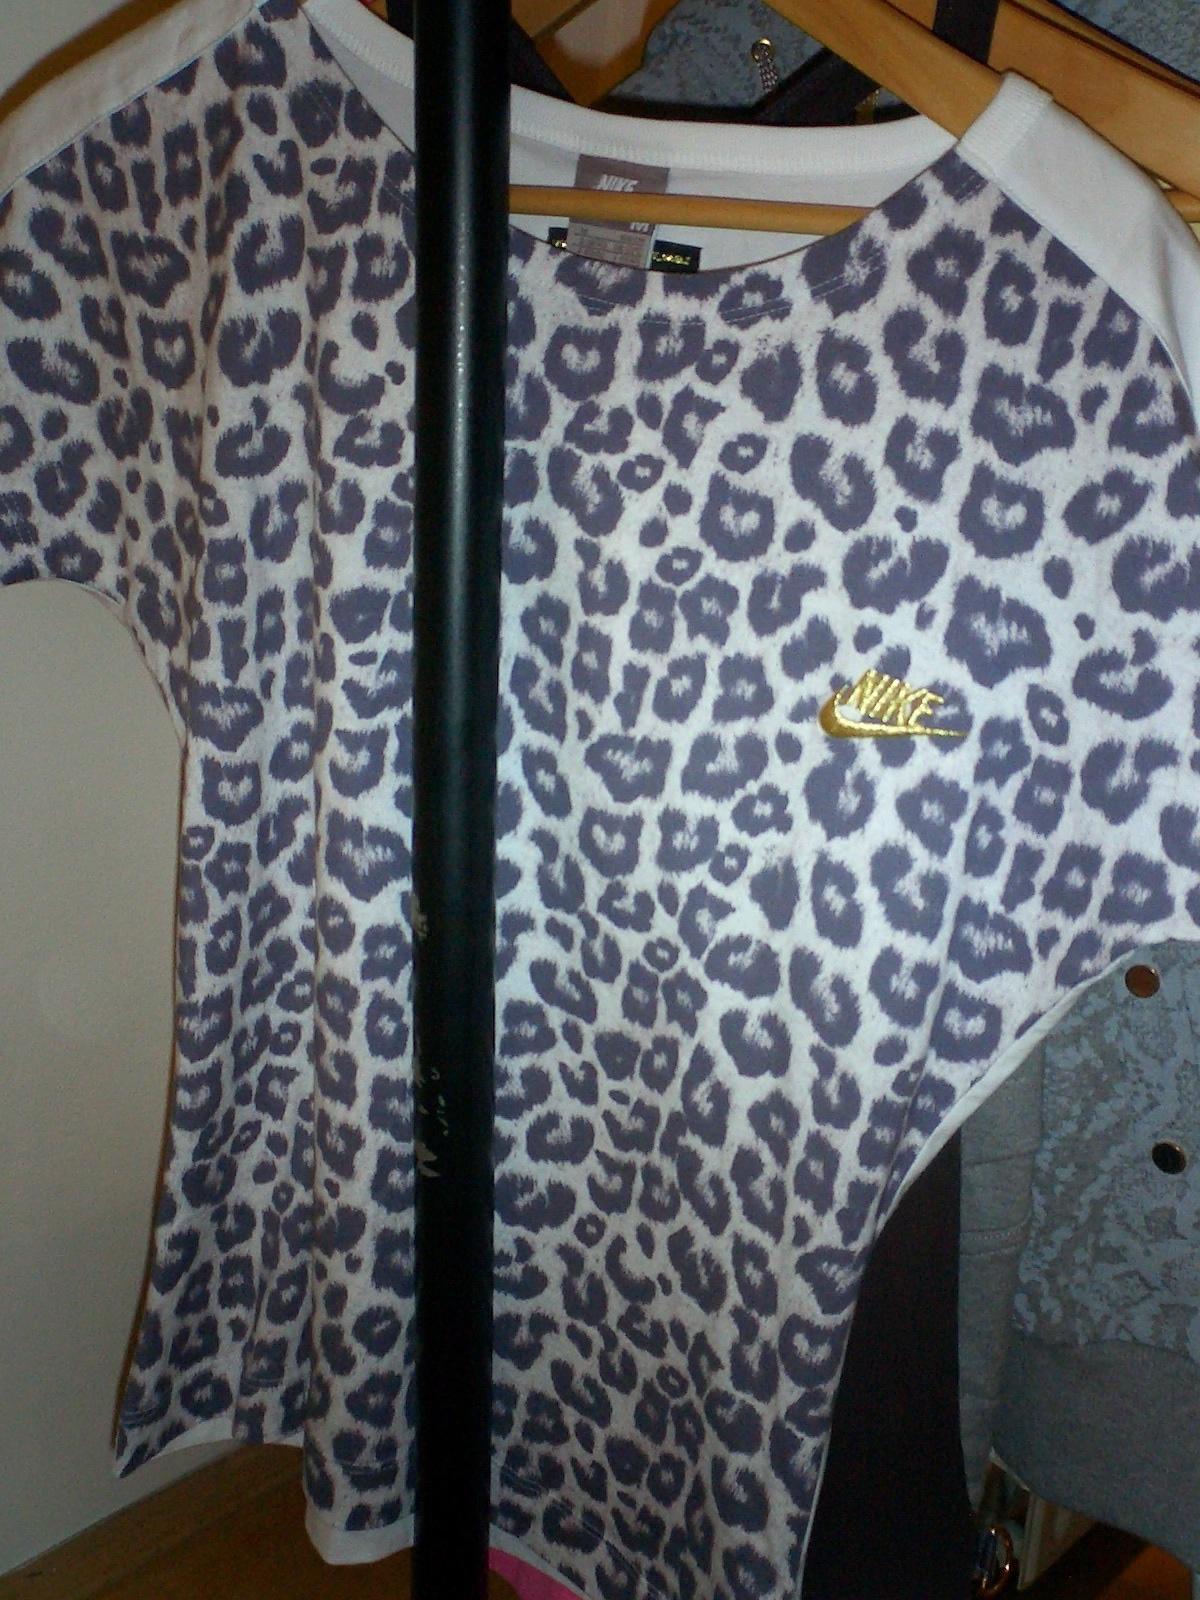 low priced 9e707 c0911 Animal Print Nike Shirt